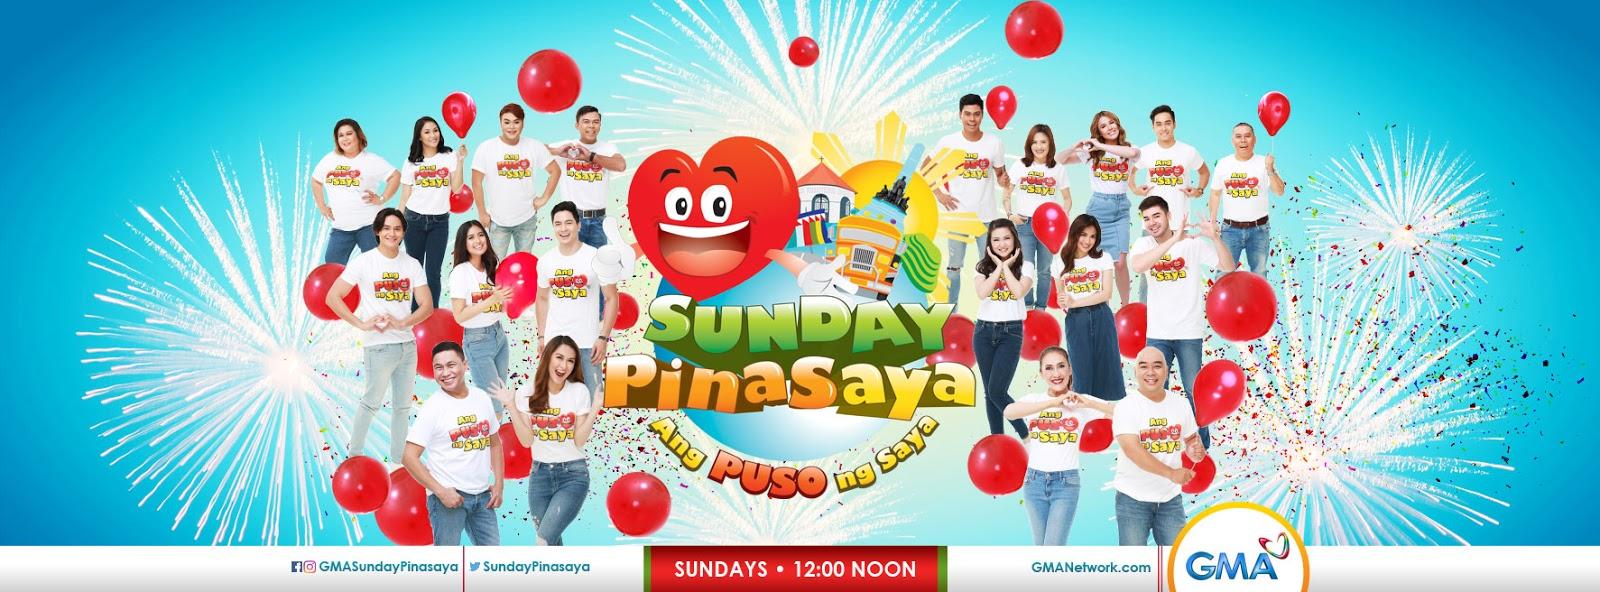 Sunday Pinasaya August 19 2018